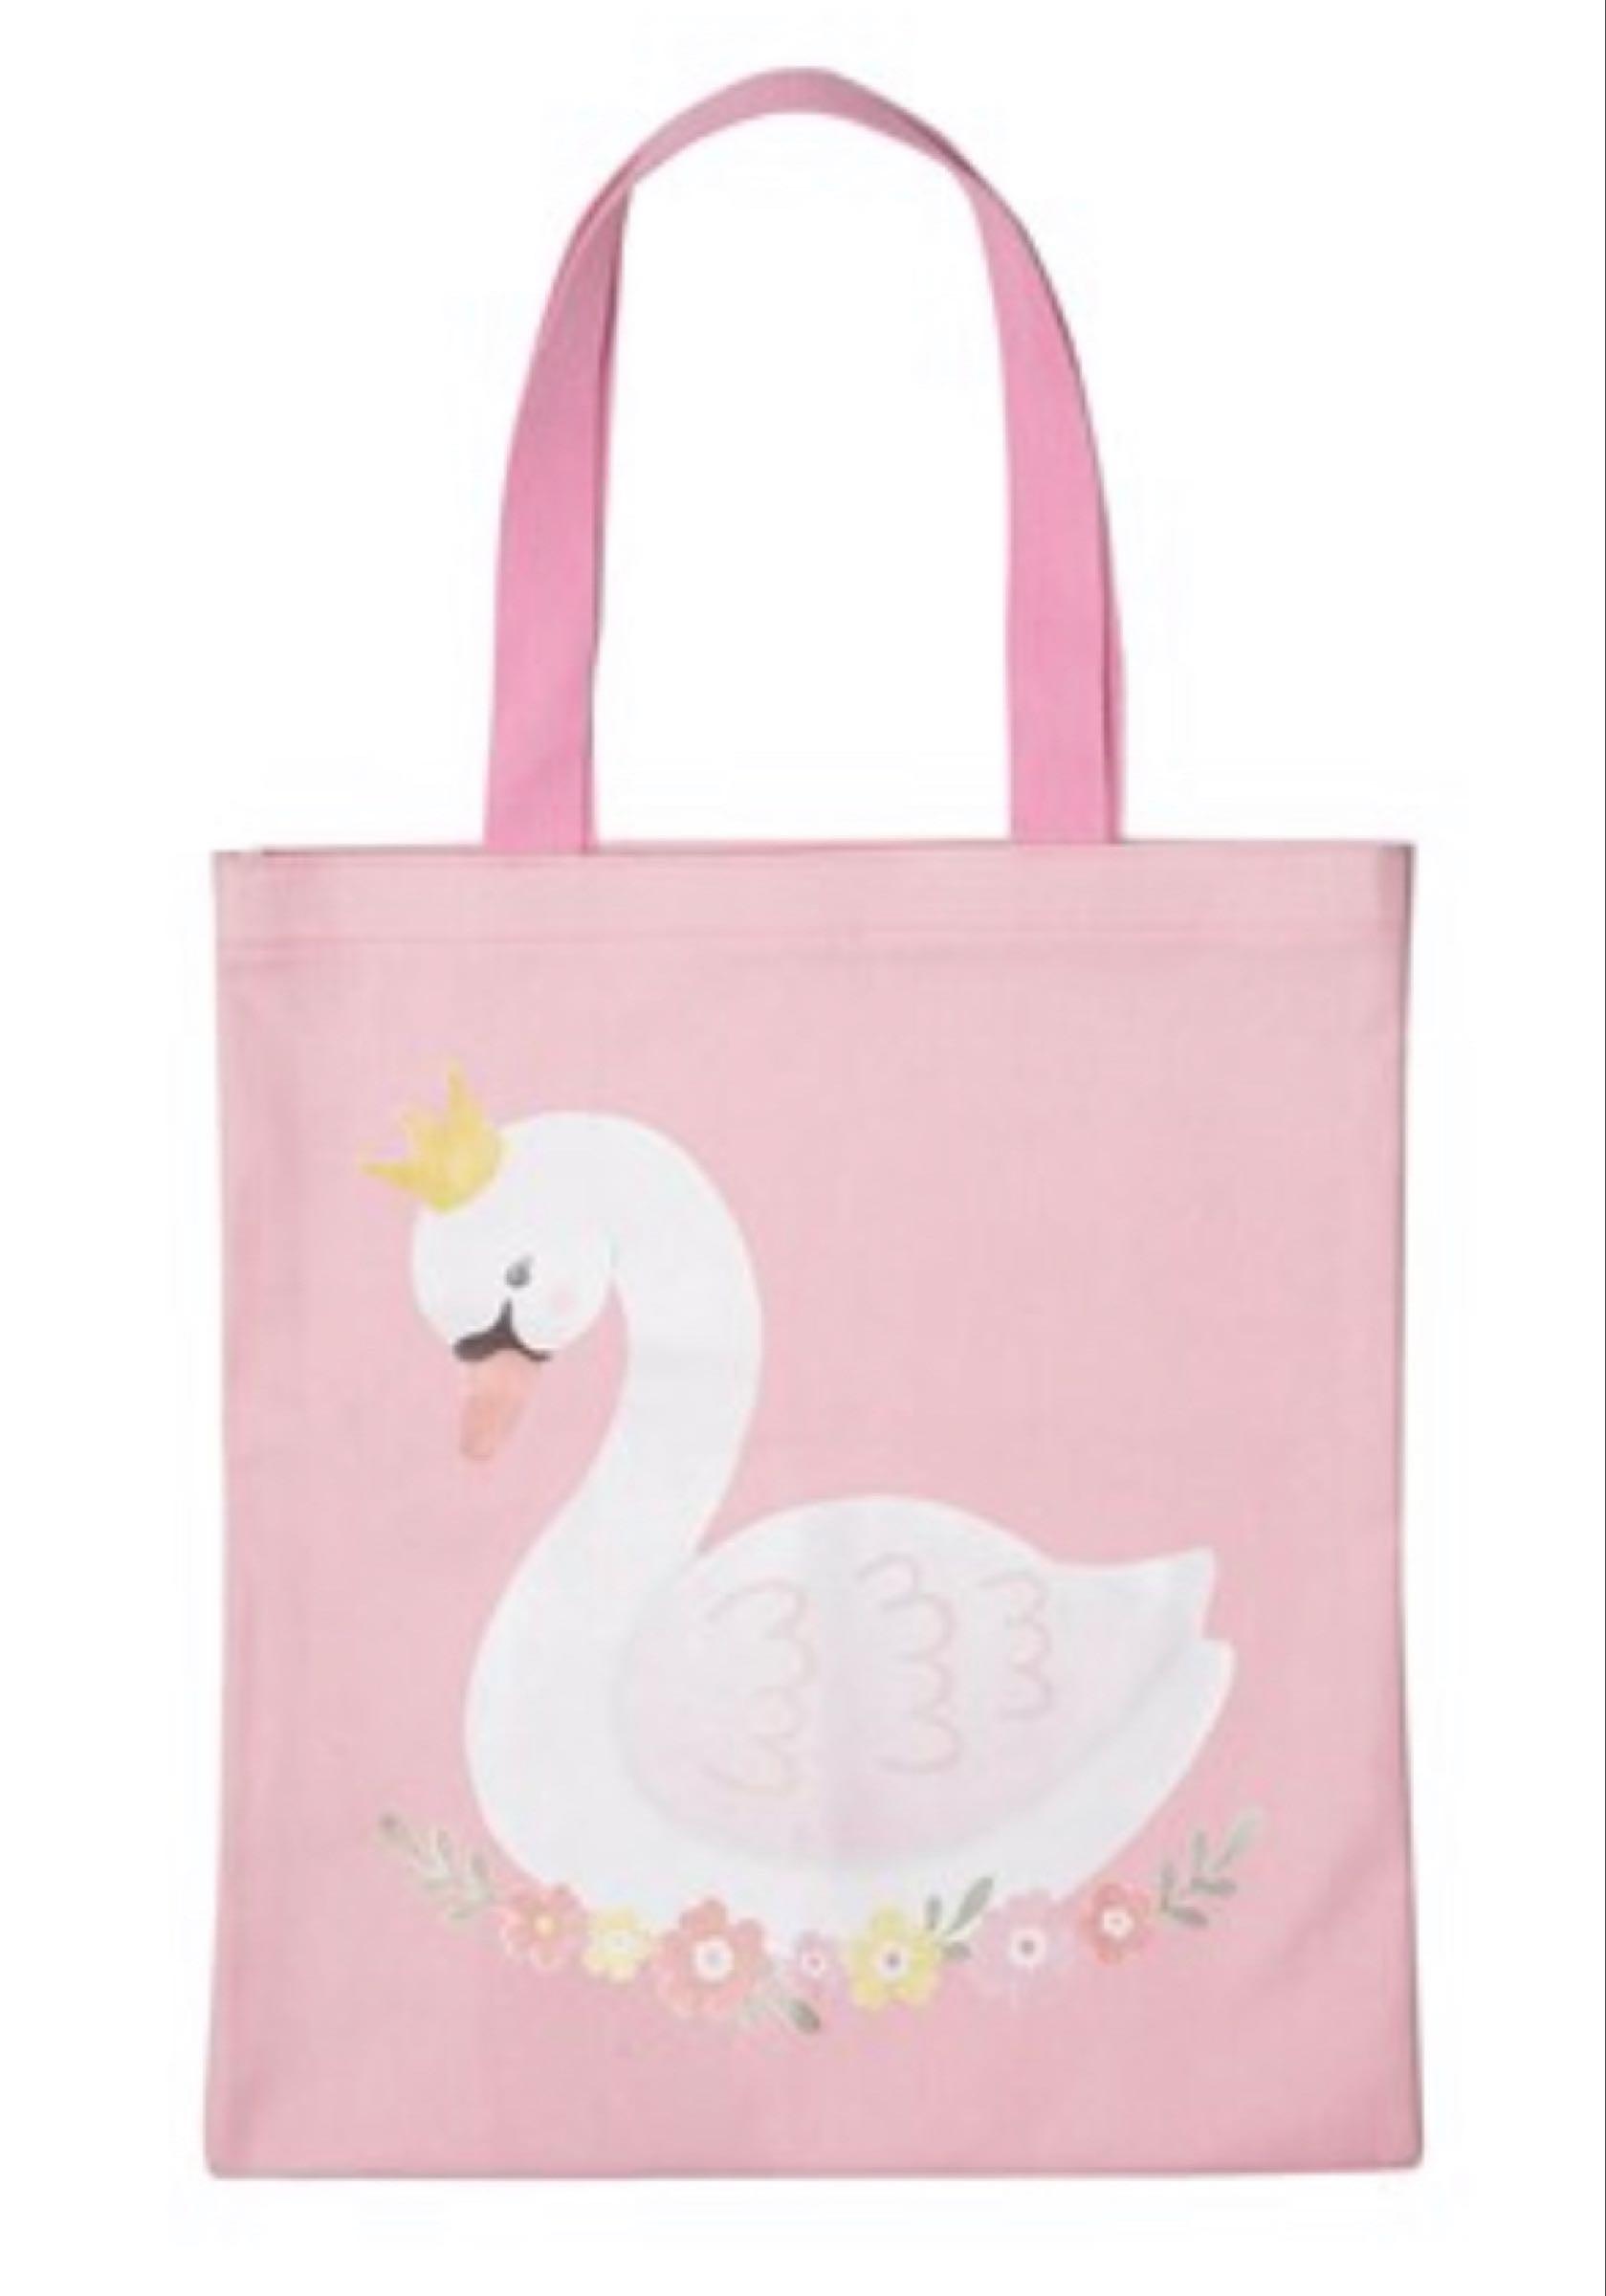 Swan Tote Bag  41.5cmx39cm (not including handles)